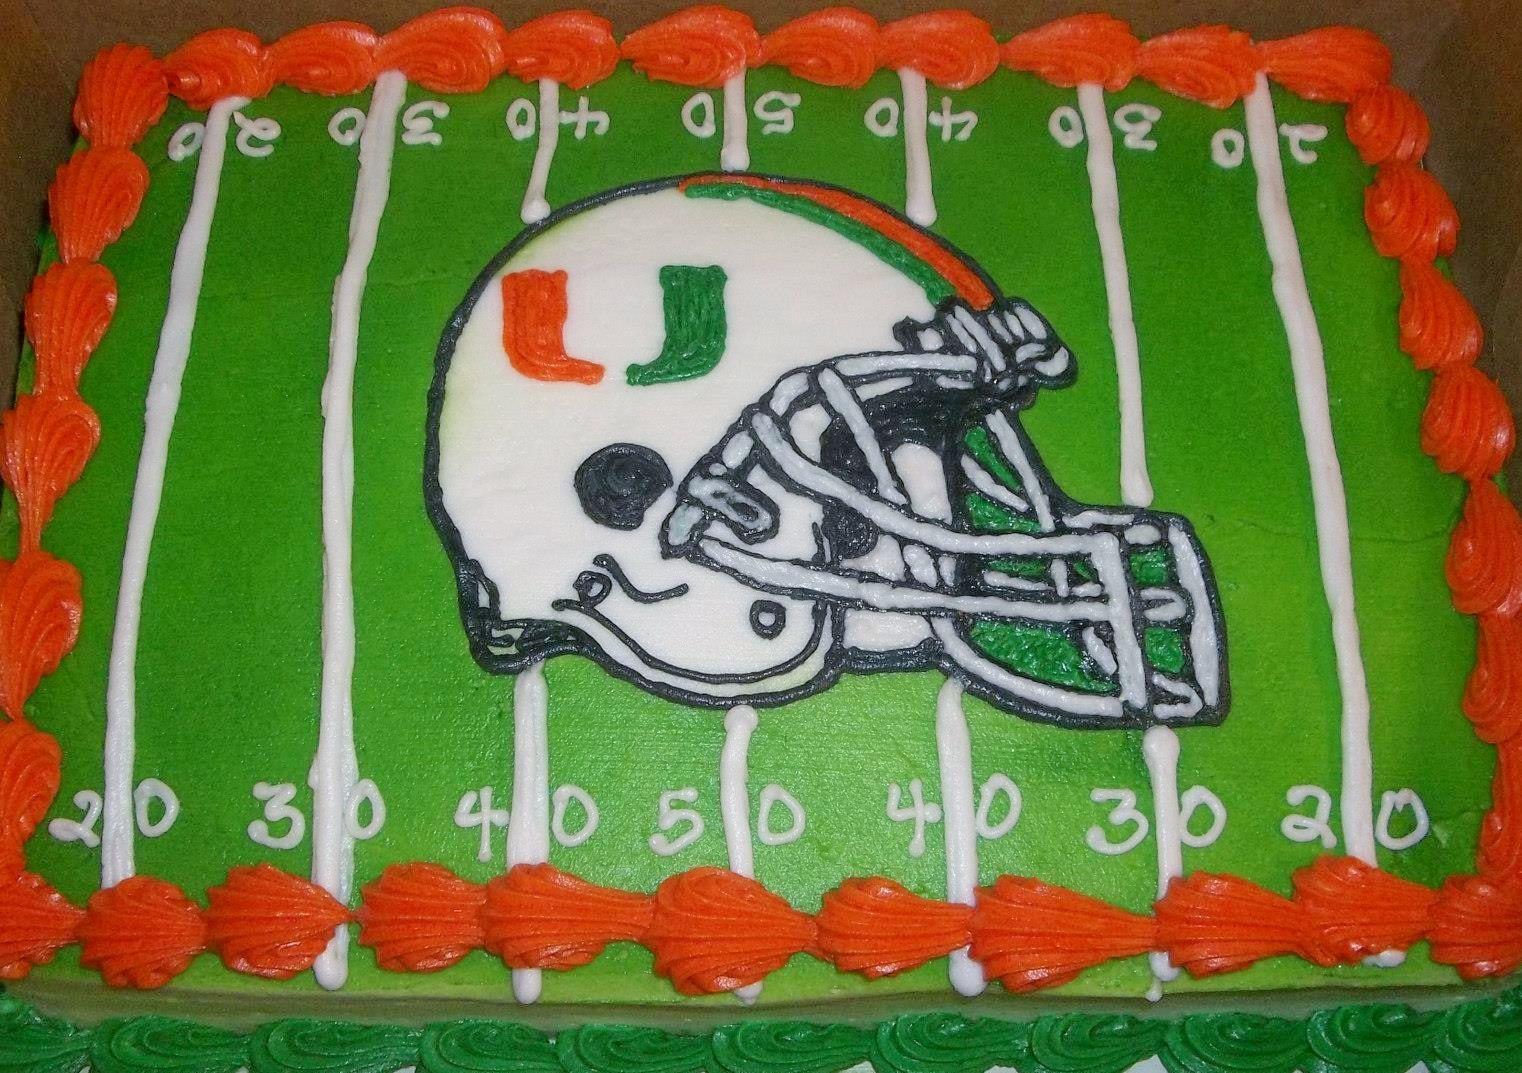 Miami Hurricanes Football Helmet Cake Paty Kakes Pinterest